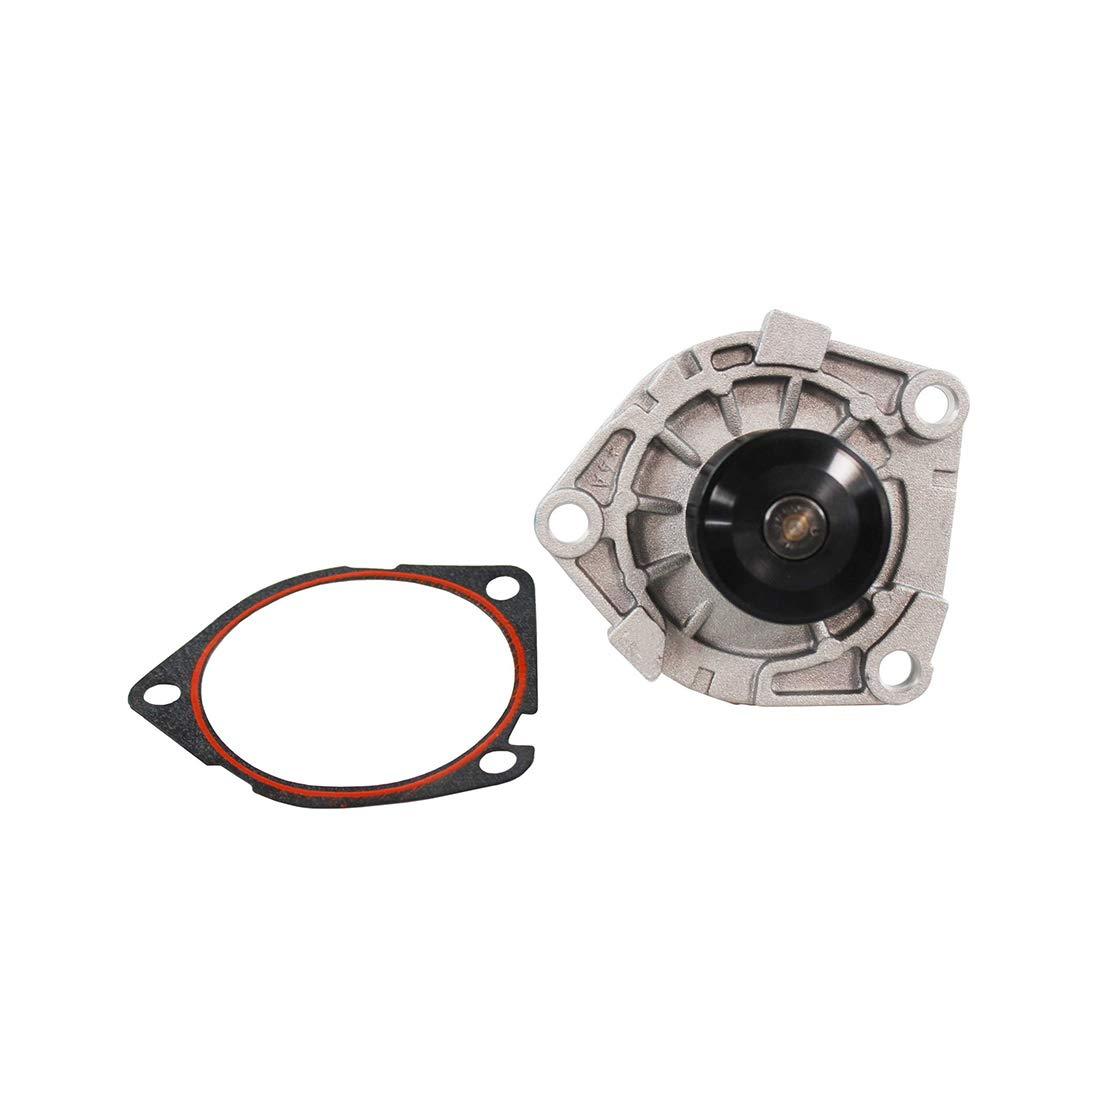 DNJ WP346 Water Pump for: 2014-2015 / Chevrolet/Cruze / 2.0L / DOHC / L4 / 16V / 119cid / LUZ / [VIN Z]